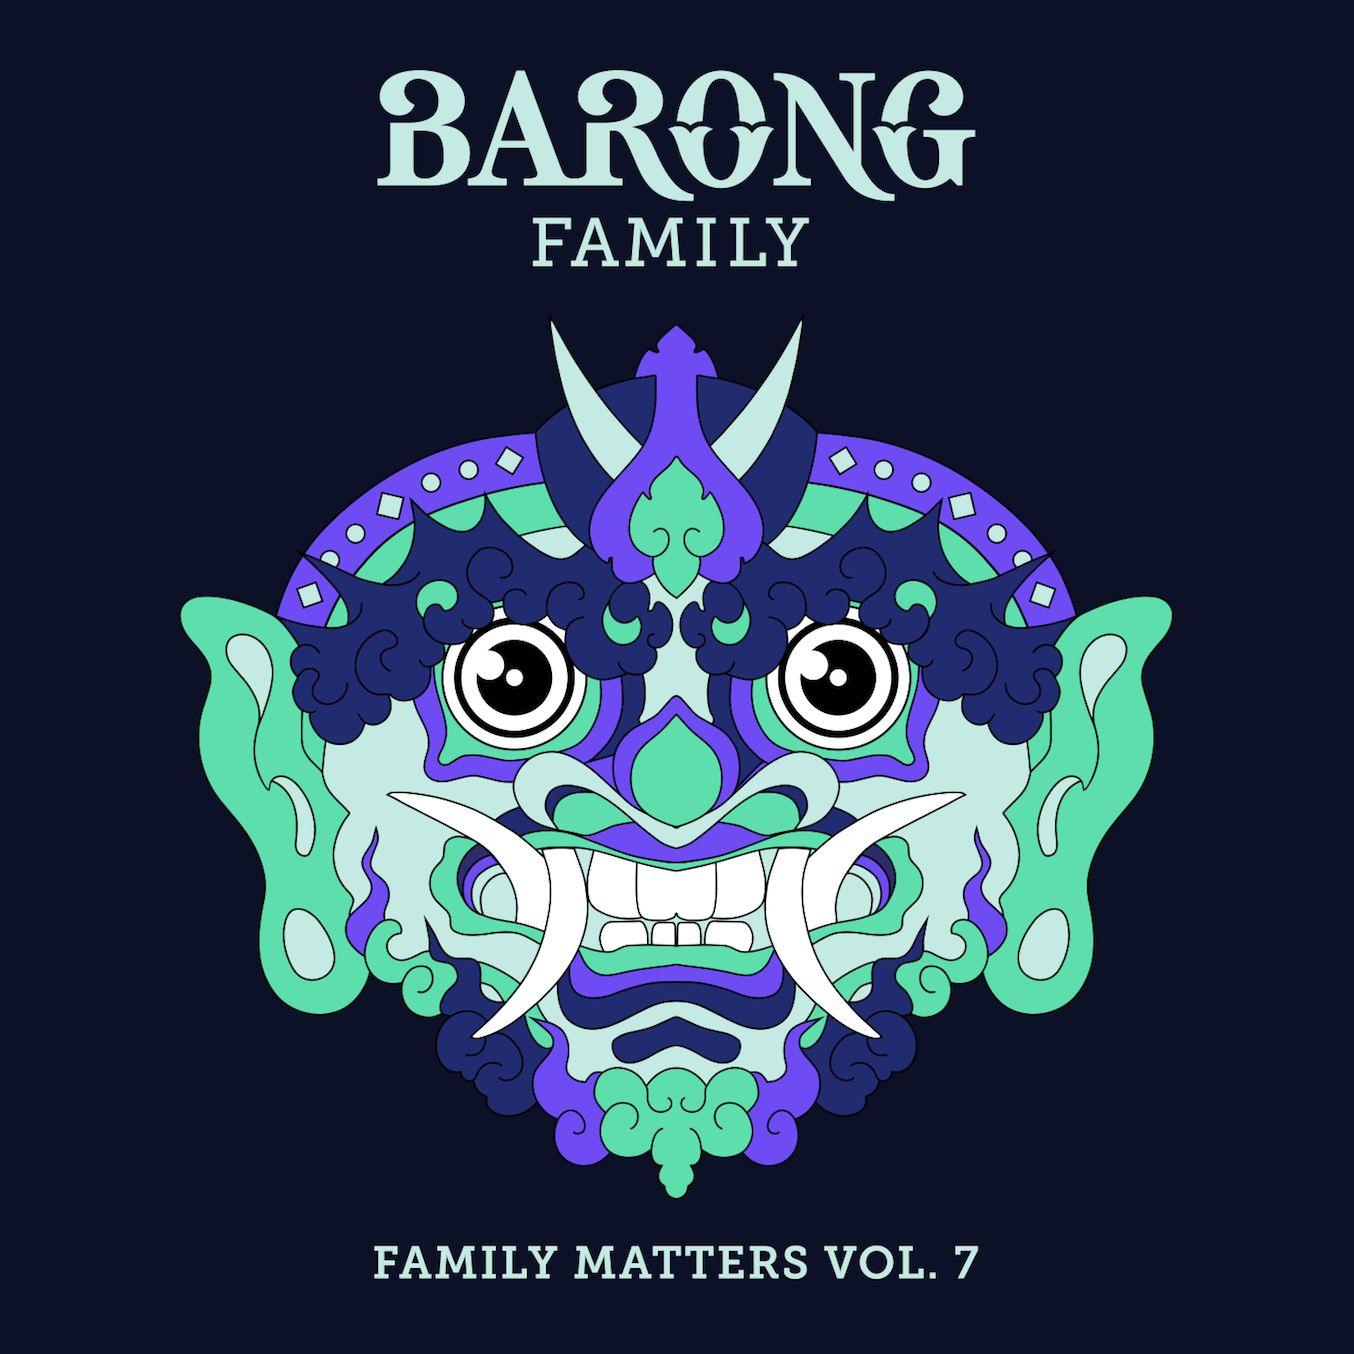 "https://www.youredm.com/ ""srcset ="" https://www.youredm.com/wp-content/uploads/2020/05/barong-family-matters-vol-7.jpg 1354w, https: / /www.youredm.com/wp-content/uploads/2020/05/barong-family-matters-vol-7-1024x1024.jpg 1024w, https://www.youredm.com/wp-content/uploads/2020/ 05 / barong-family-matters-vol-7-150x150.jpg 150w, https://www.youredm.com/wp-content/uploads/2020/05/barong-family-matters-vol-7-768x768.jpg 768w, https://www.youredm.com/wp-content/uploads/2020/05/barong-family-matters-vol-7-125x125.jpg 125w ""size ="" (larghezza massima: 1354px) 100vw, 1354px ""/></div> </div> <section class="